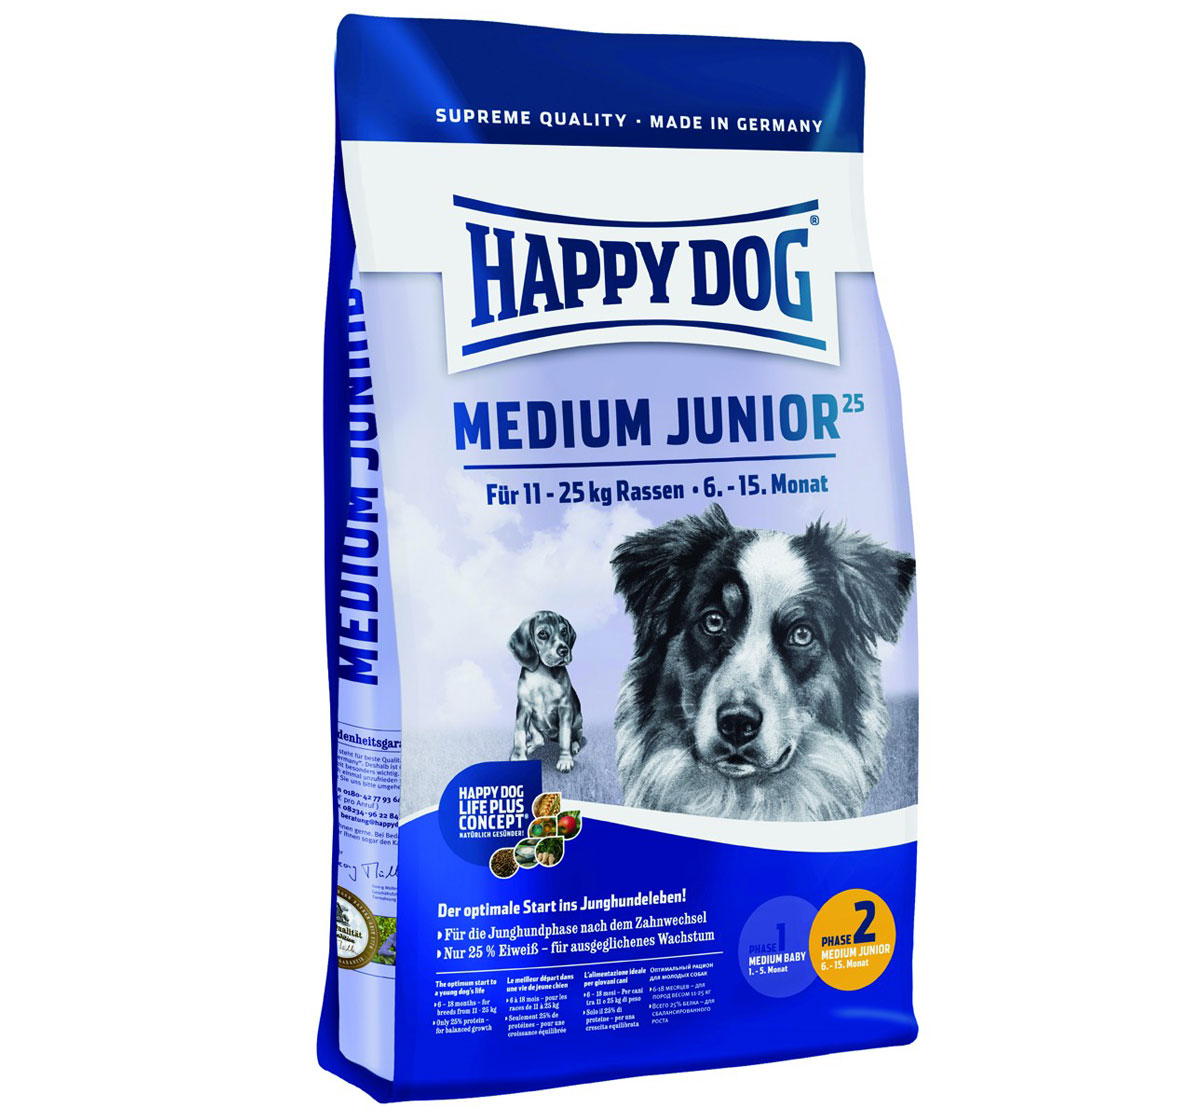 Happy Dog Medium Breed Junior Dog Food 10 Kg | DogSpot ... - photo#4